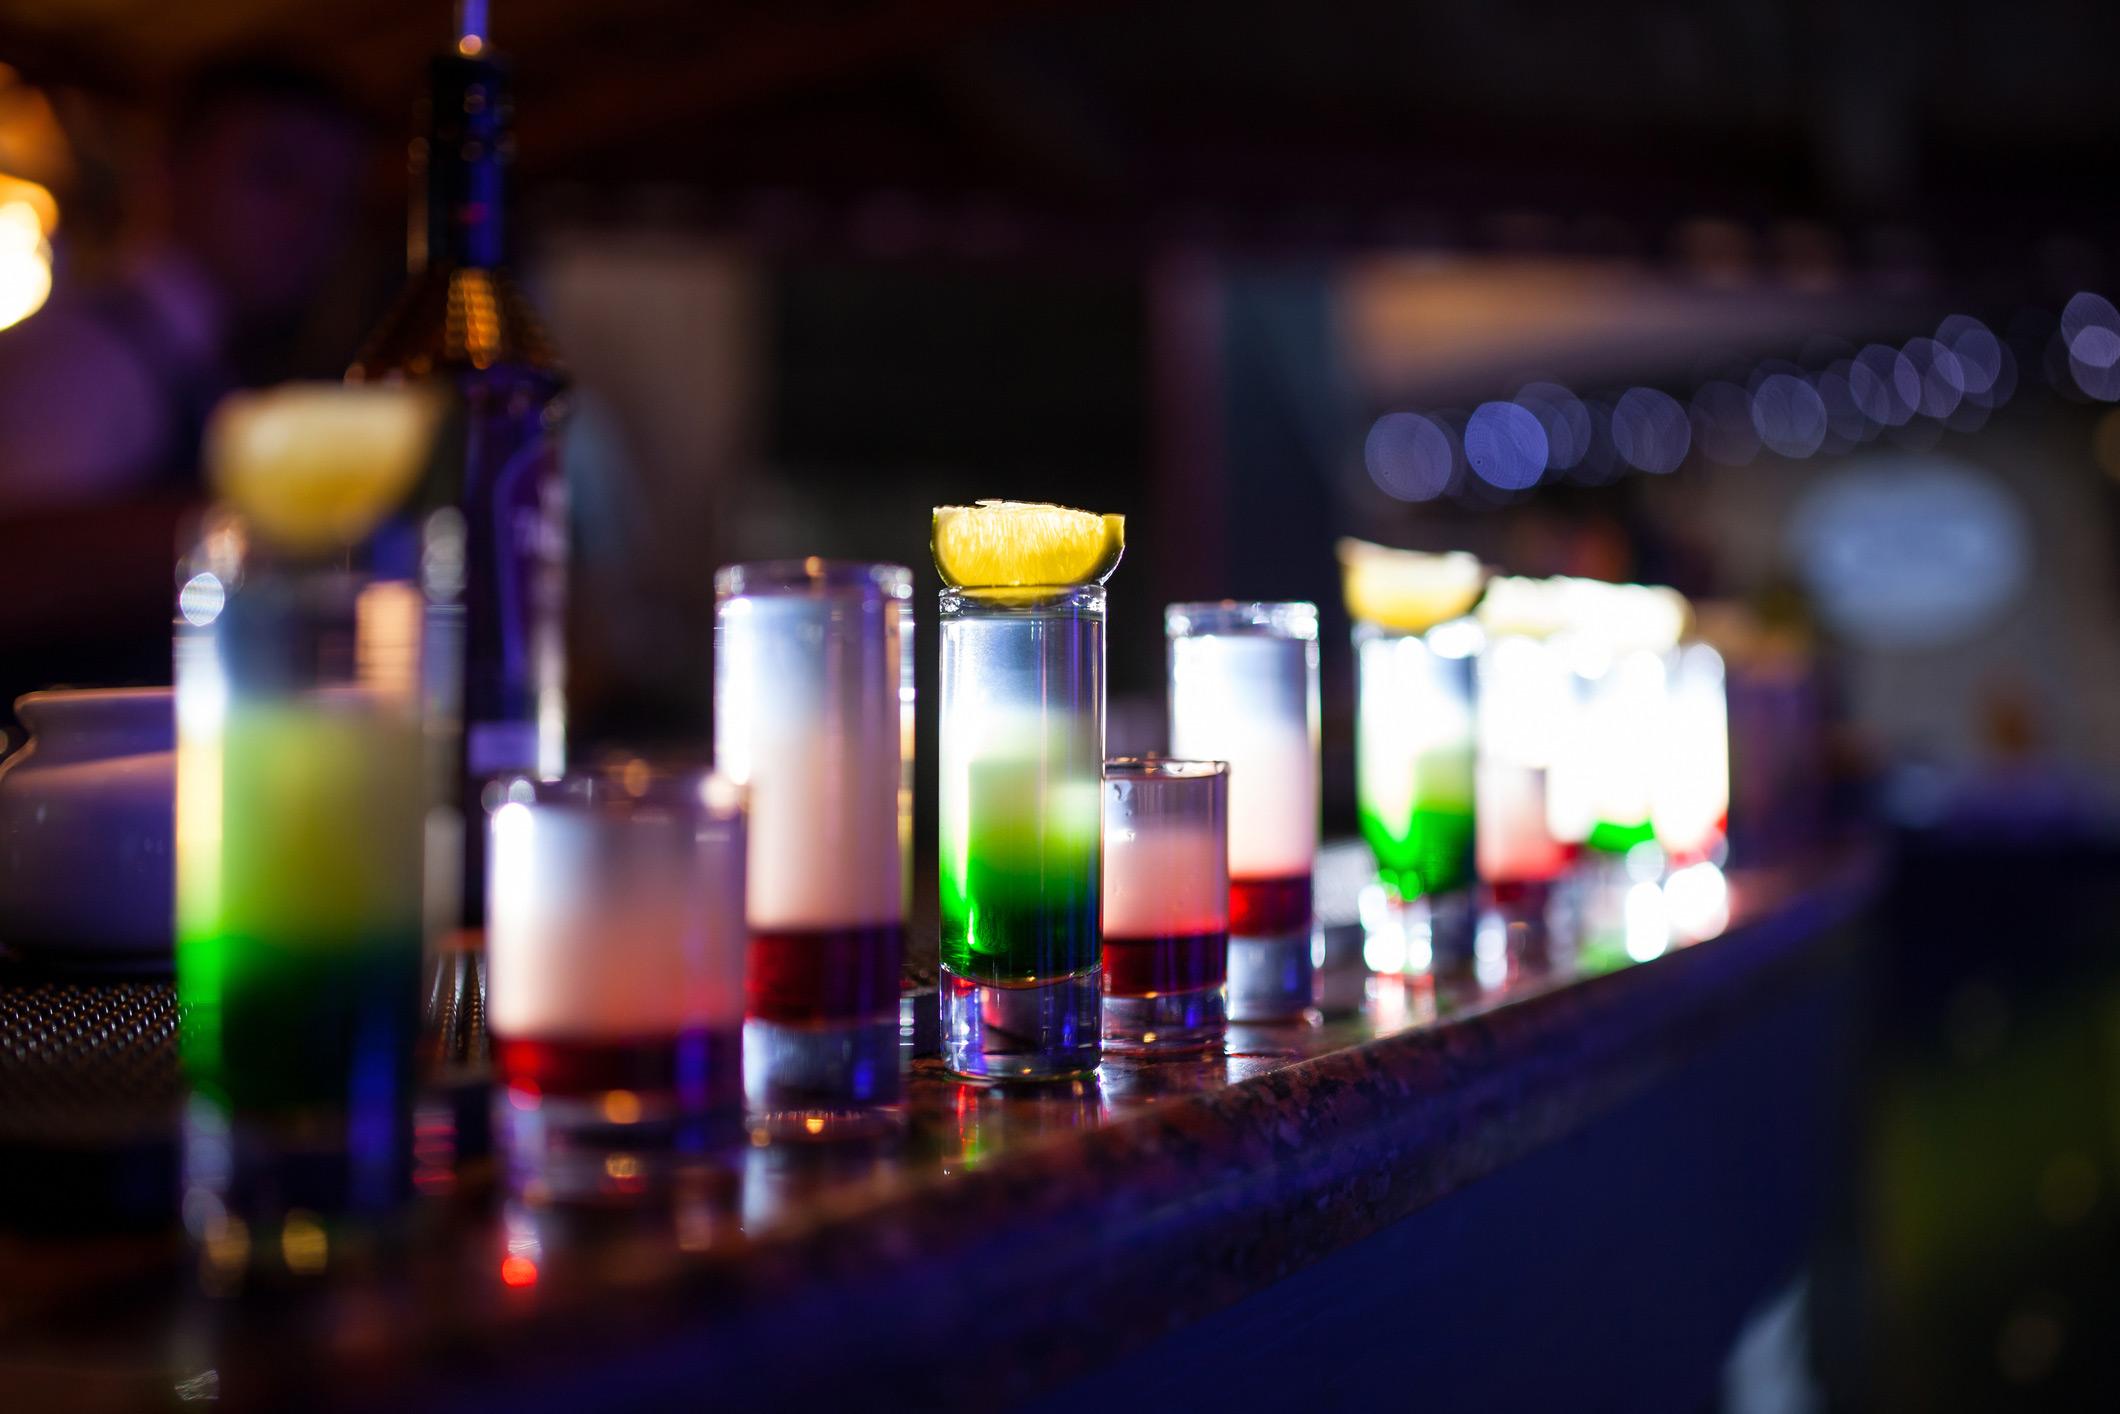 https://cf.ltkcdn.net/cocktails/images/orig/219564-2120x1414-line-up-of-shots-on-bar.jpg